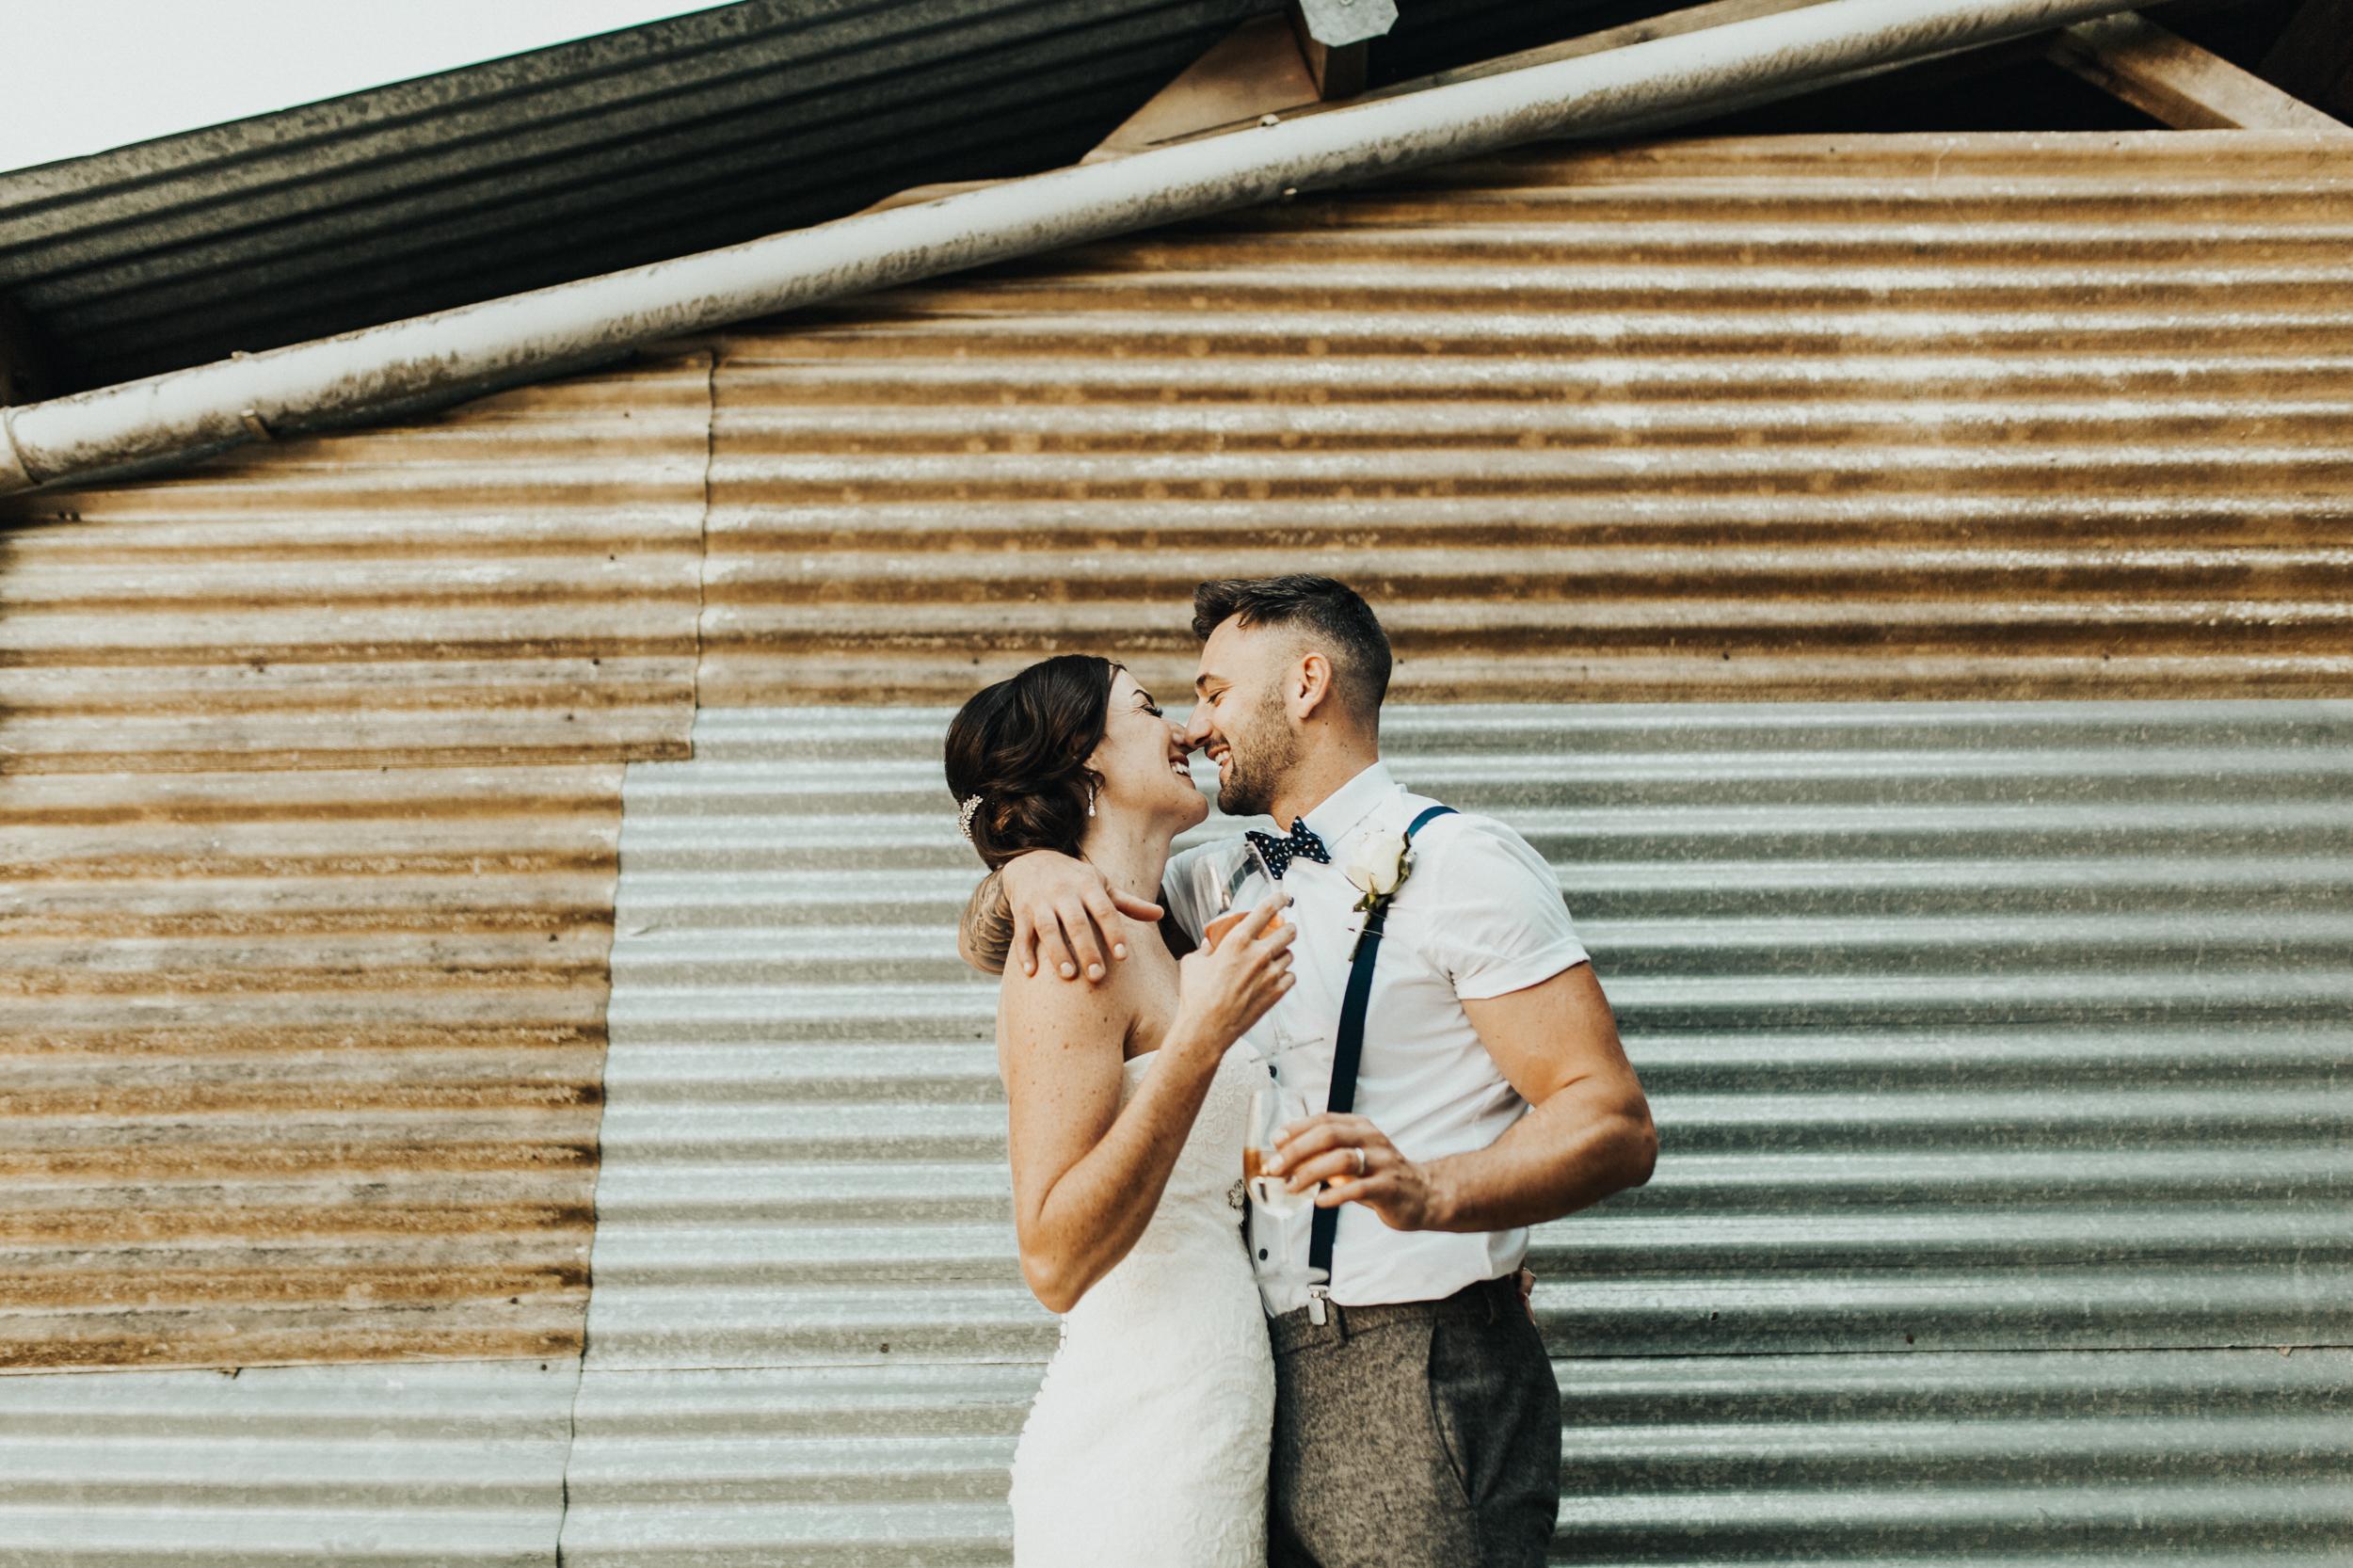 Amy-Zac-Destination-Wedding-France-Manoir-Foulquetiere-Darina-Stoda-Photography-67.jpg